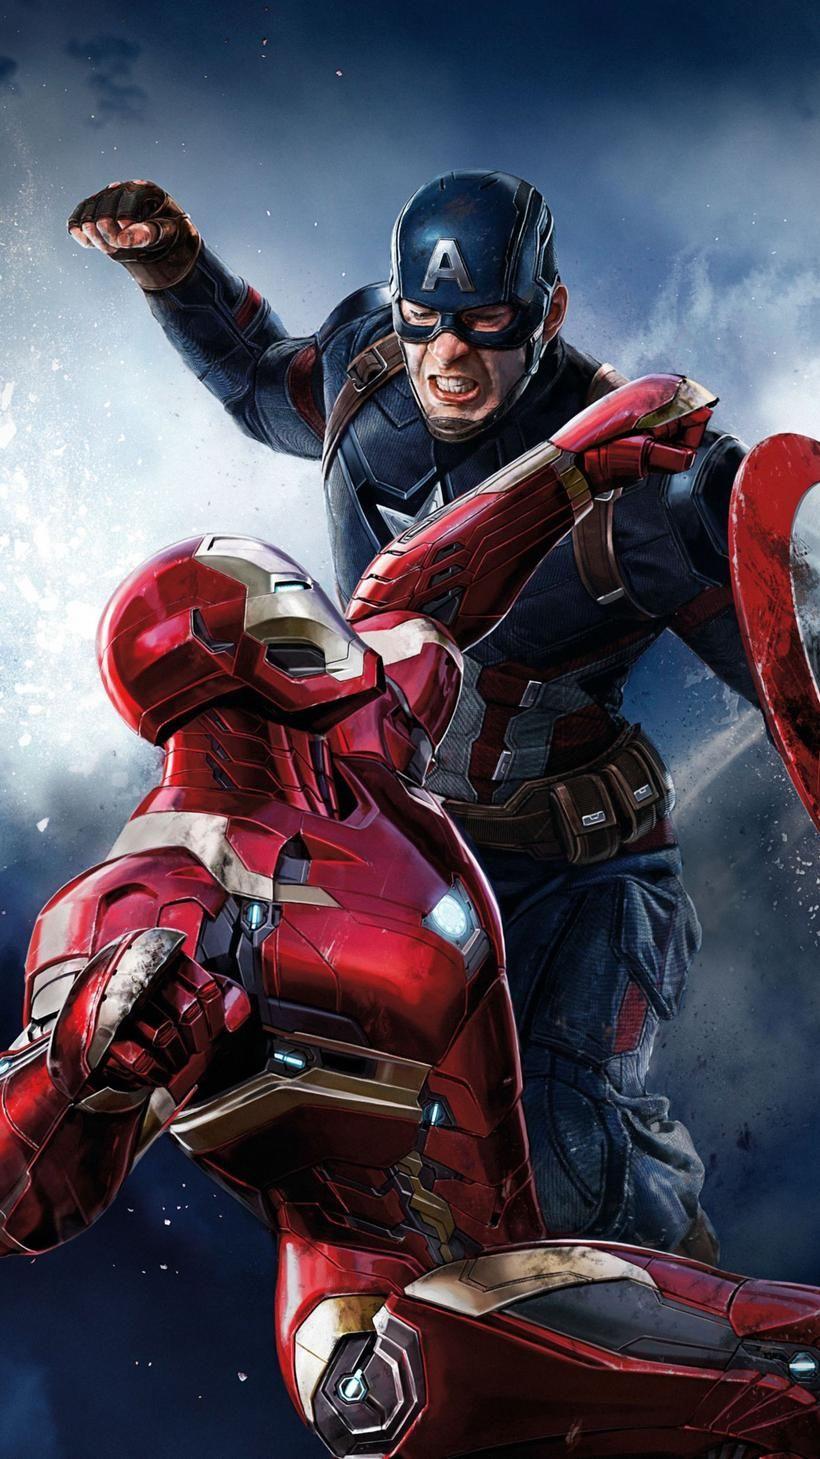 Avengers Age Of Ultron 2015 Phone Wallpaper Iron Man